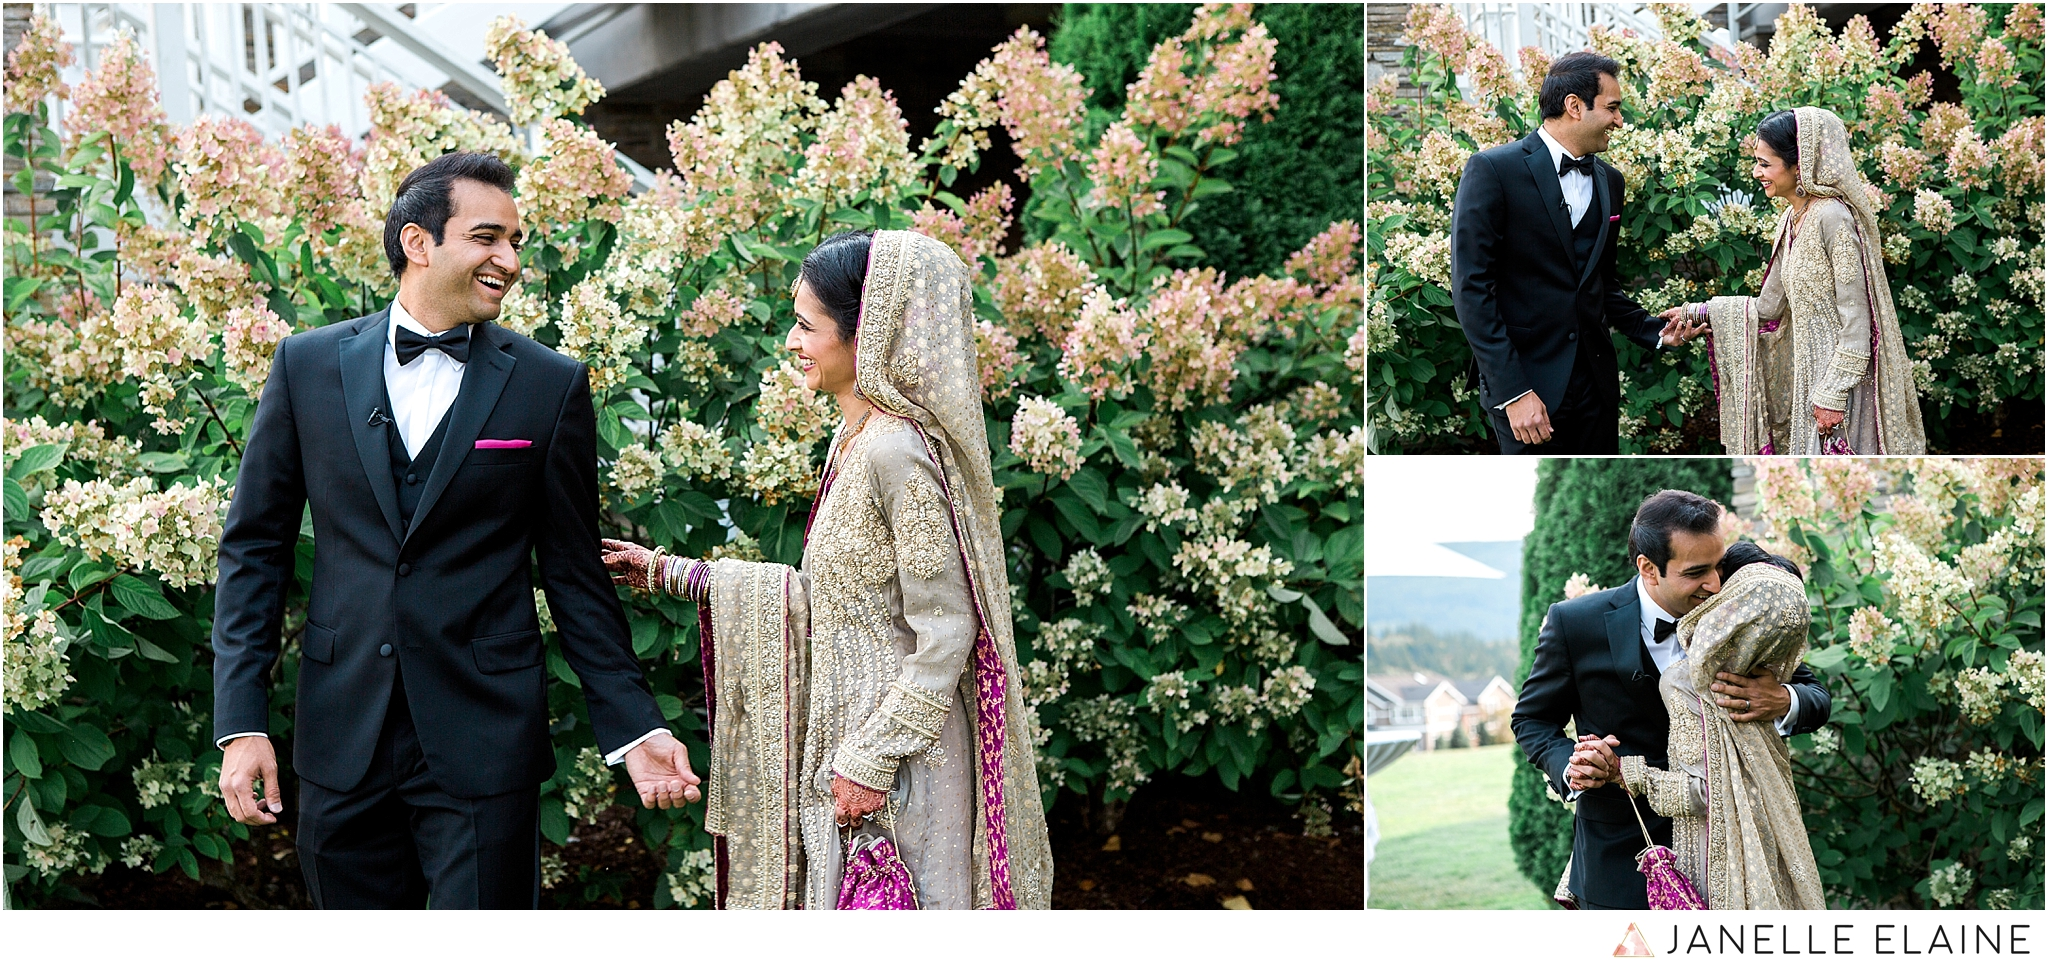 janelle elaine photography-the club at snoqualmie ridge-washington-wedding-photography-portraits-10.jpg